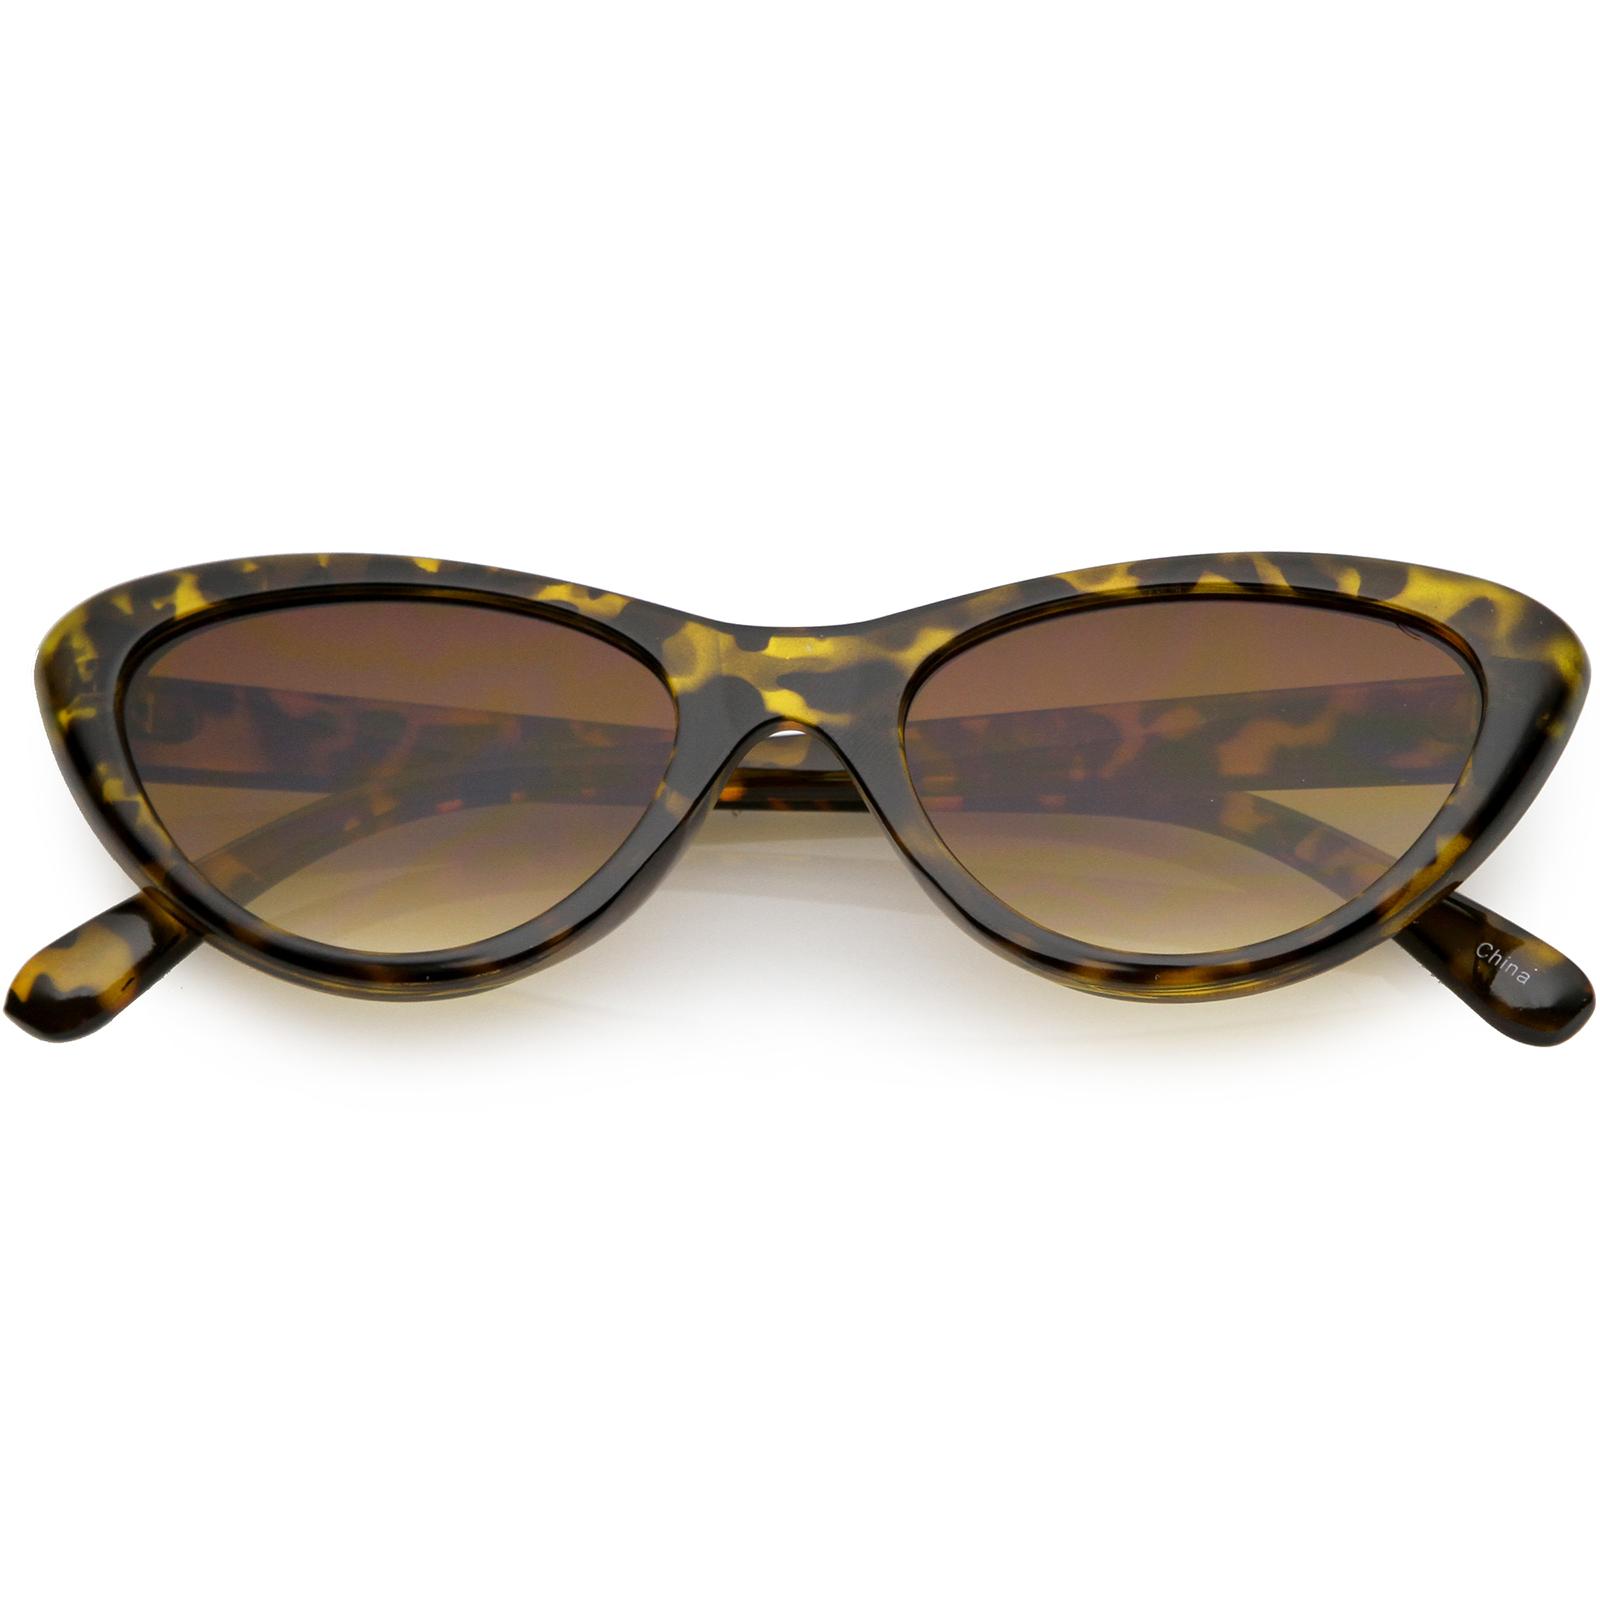 sunglassLA - Small Retro Cat Eye Sunglasses Neutral Colored Lens 49mm - 49mm